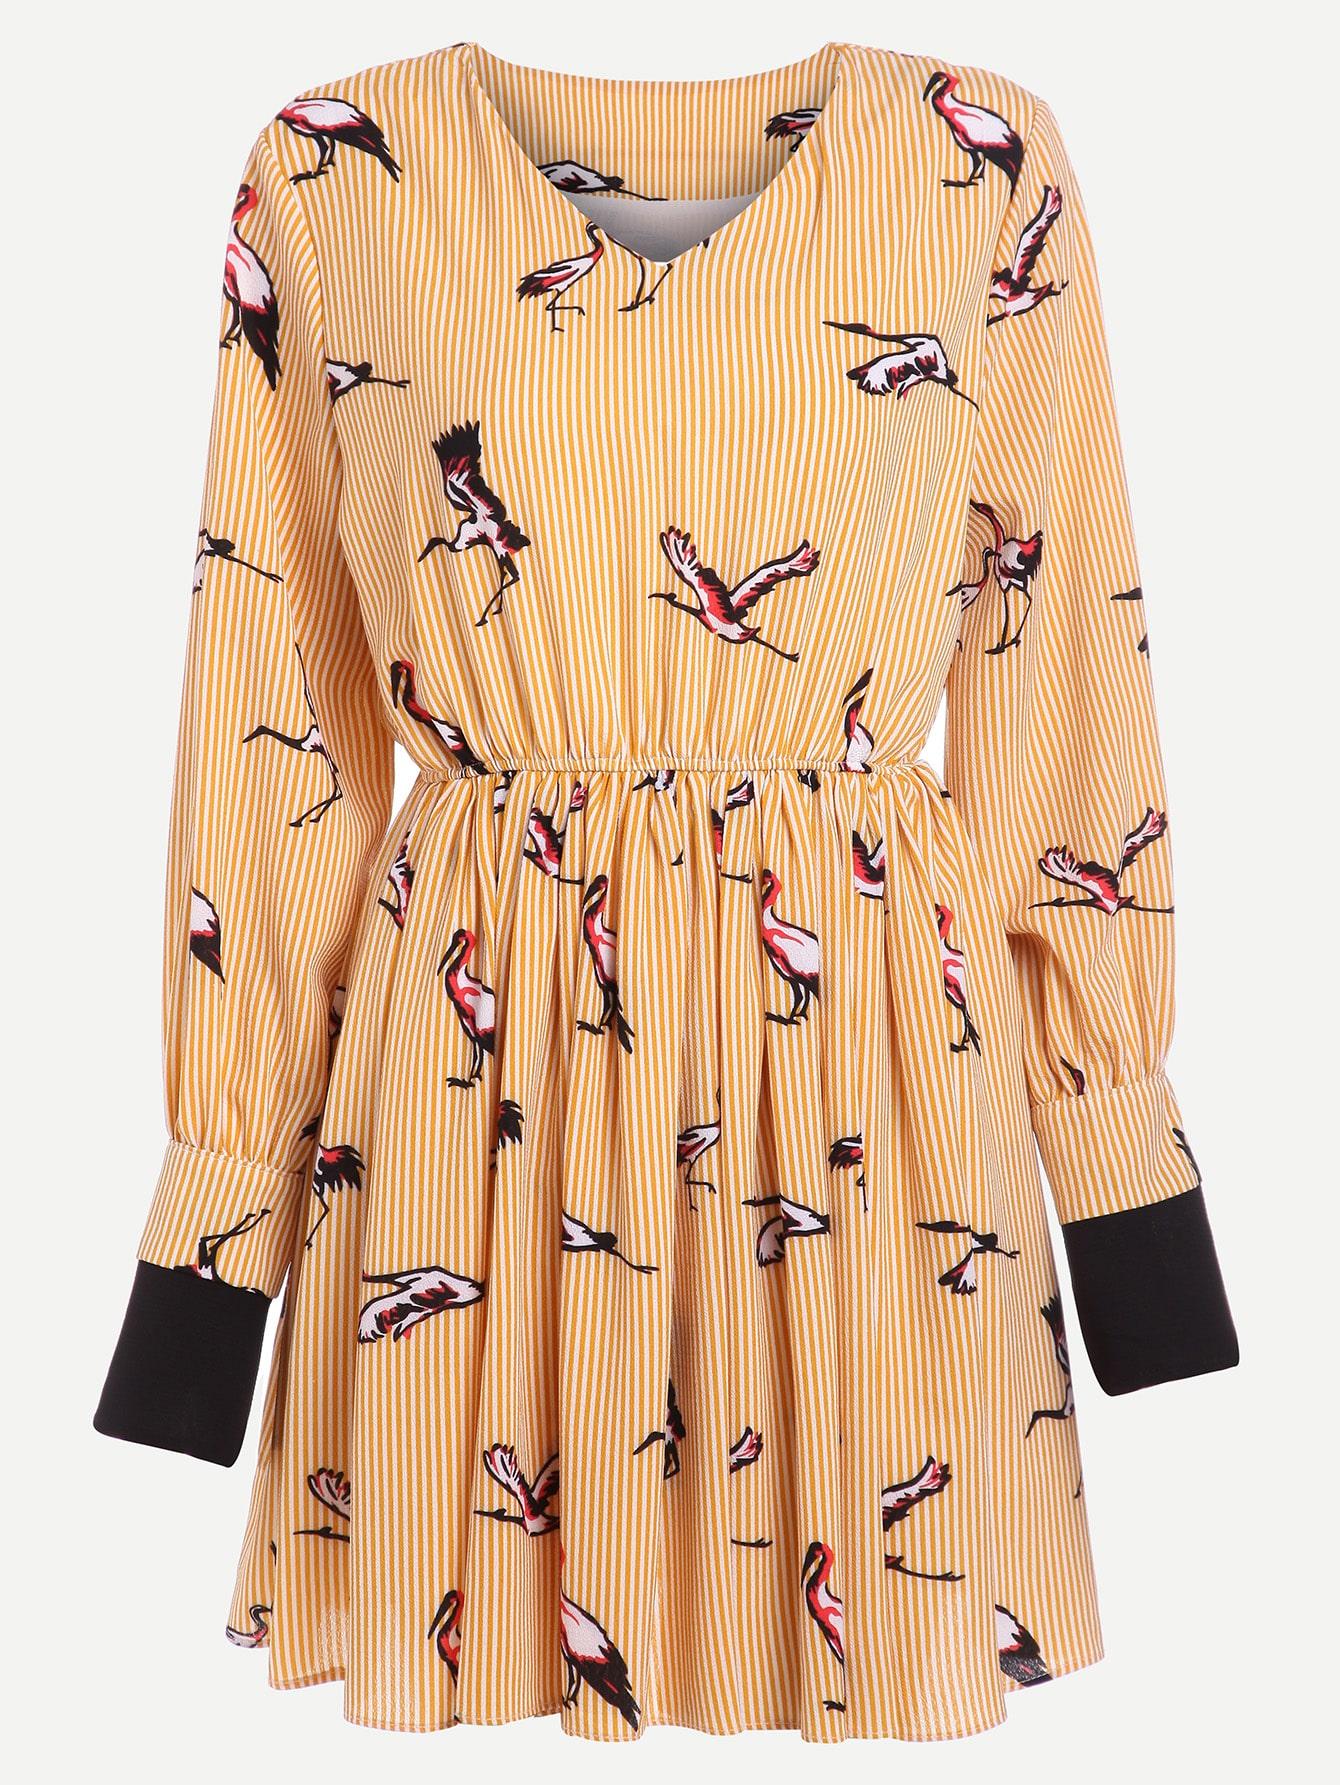 Contrast Cuff Vertical Striped Cranes Print Dress dress170427401